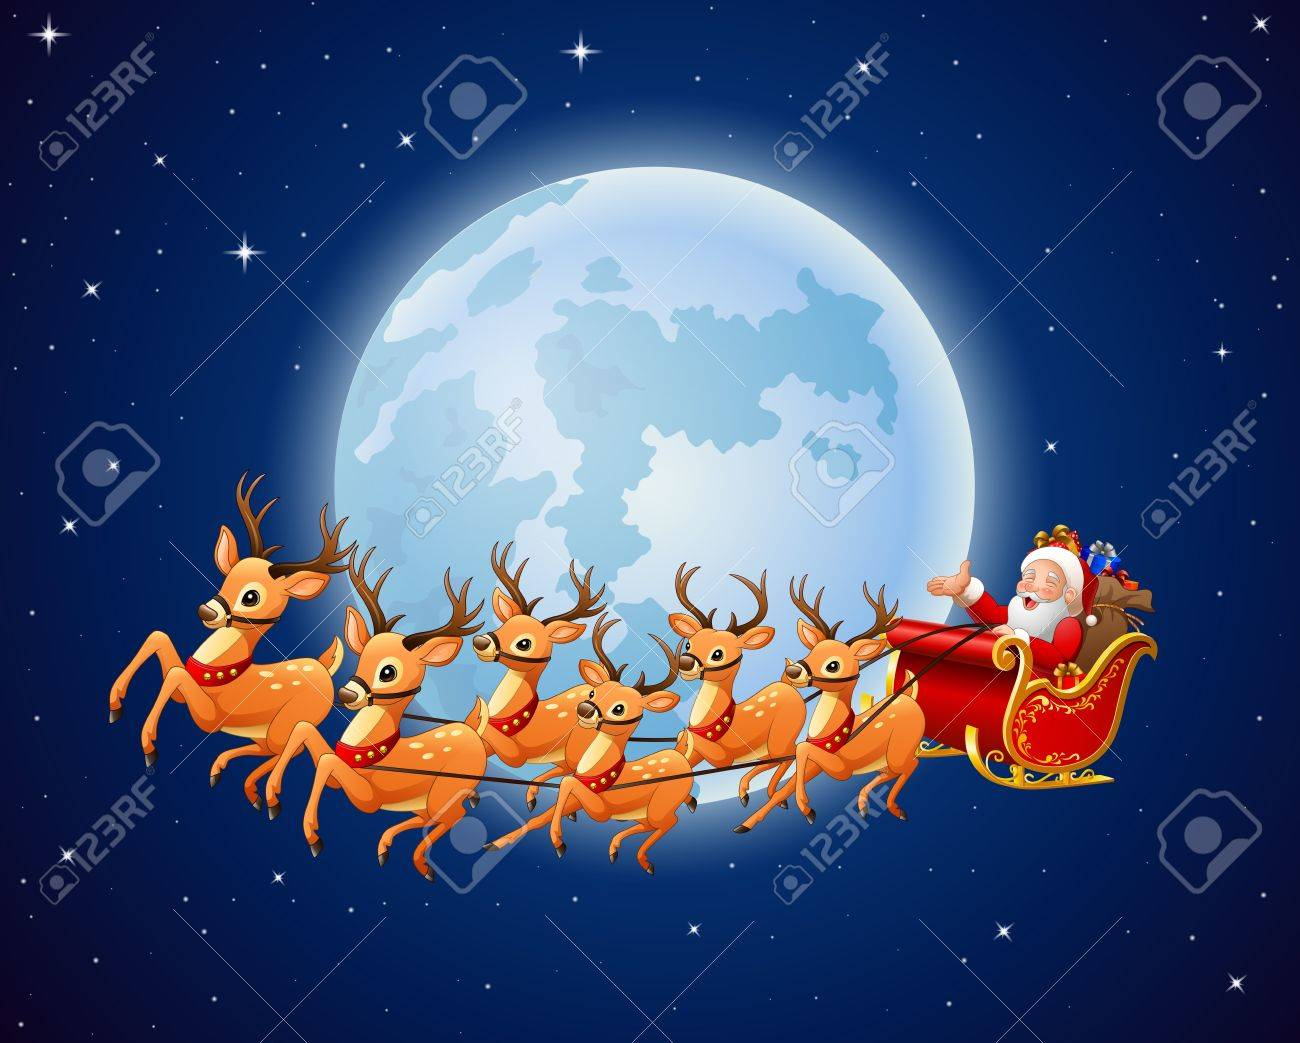 illustration of santa claus rides reindeer sleigh against a full